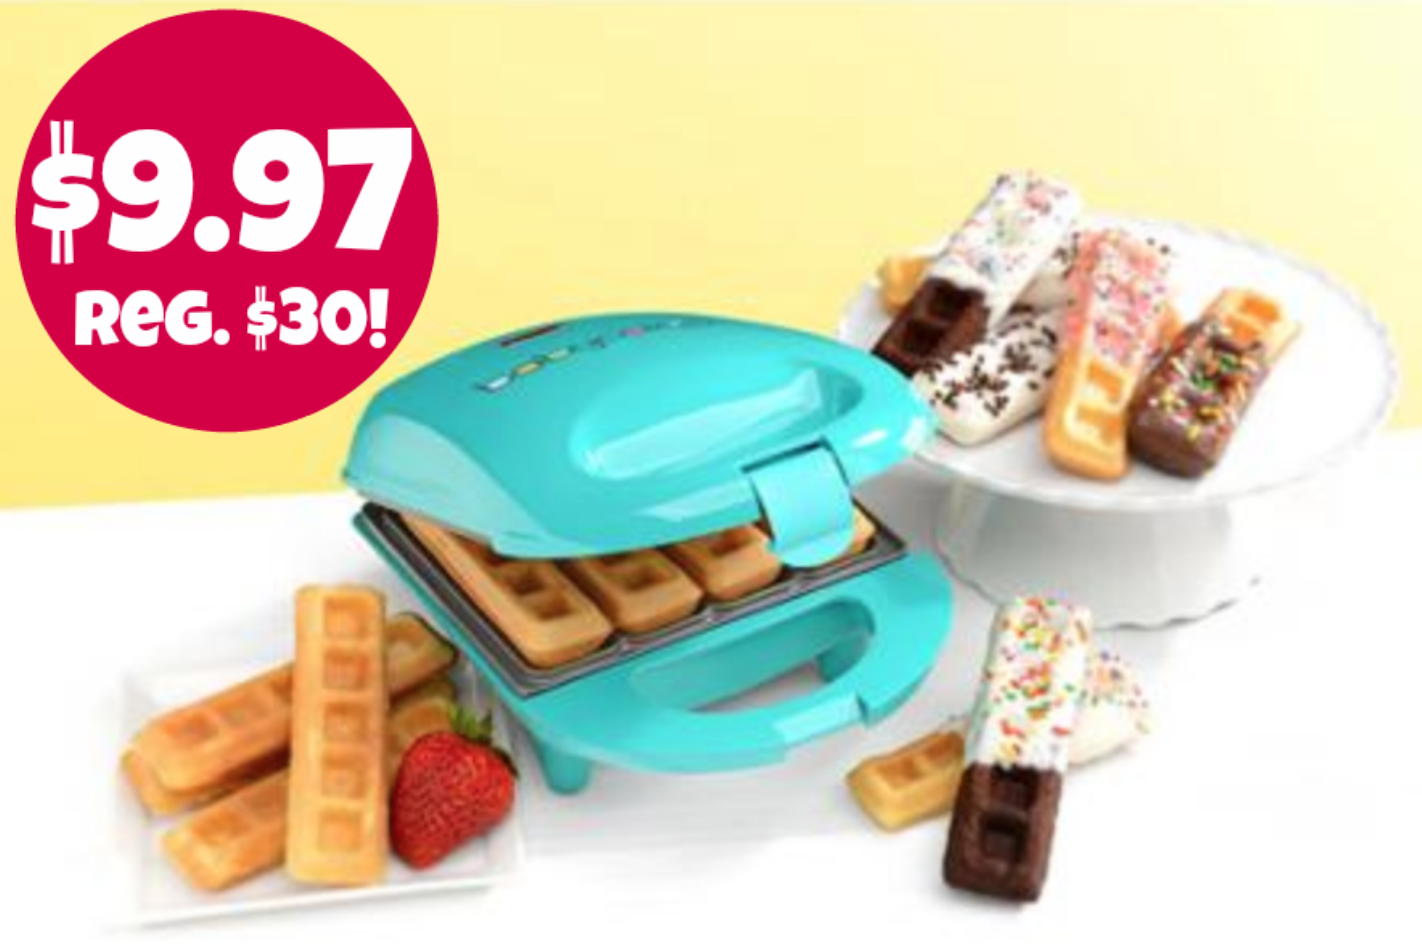 http://www.thebinderladies.com/2014/10/walmartcom-babycakes-mini-waffle-stick.html#.VFDkxb7duyM